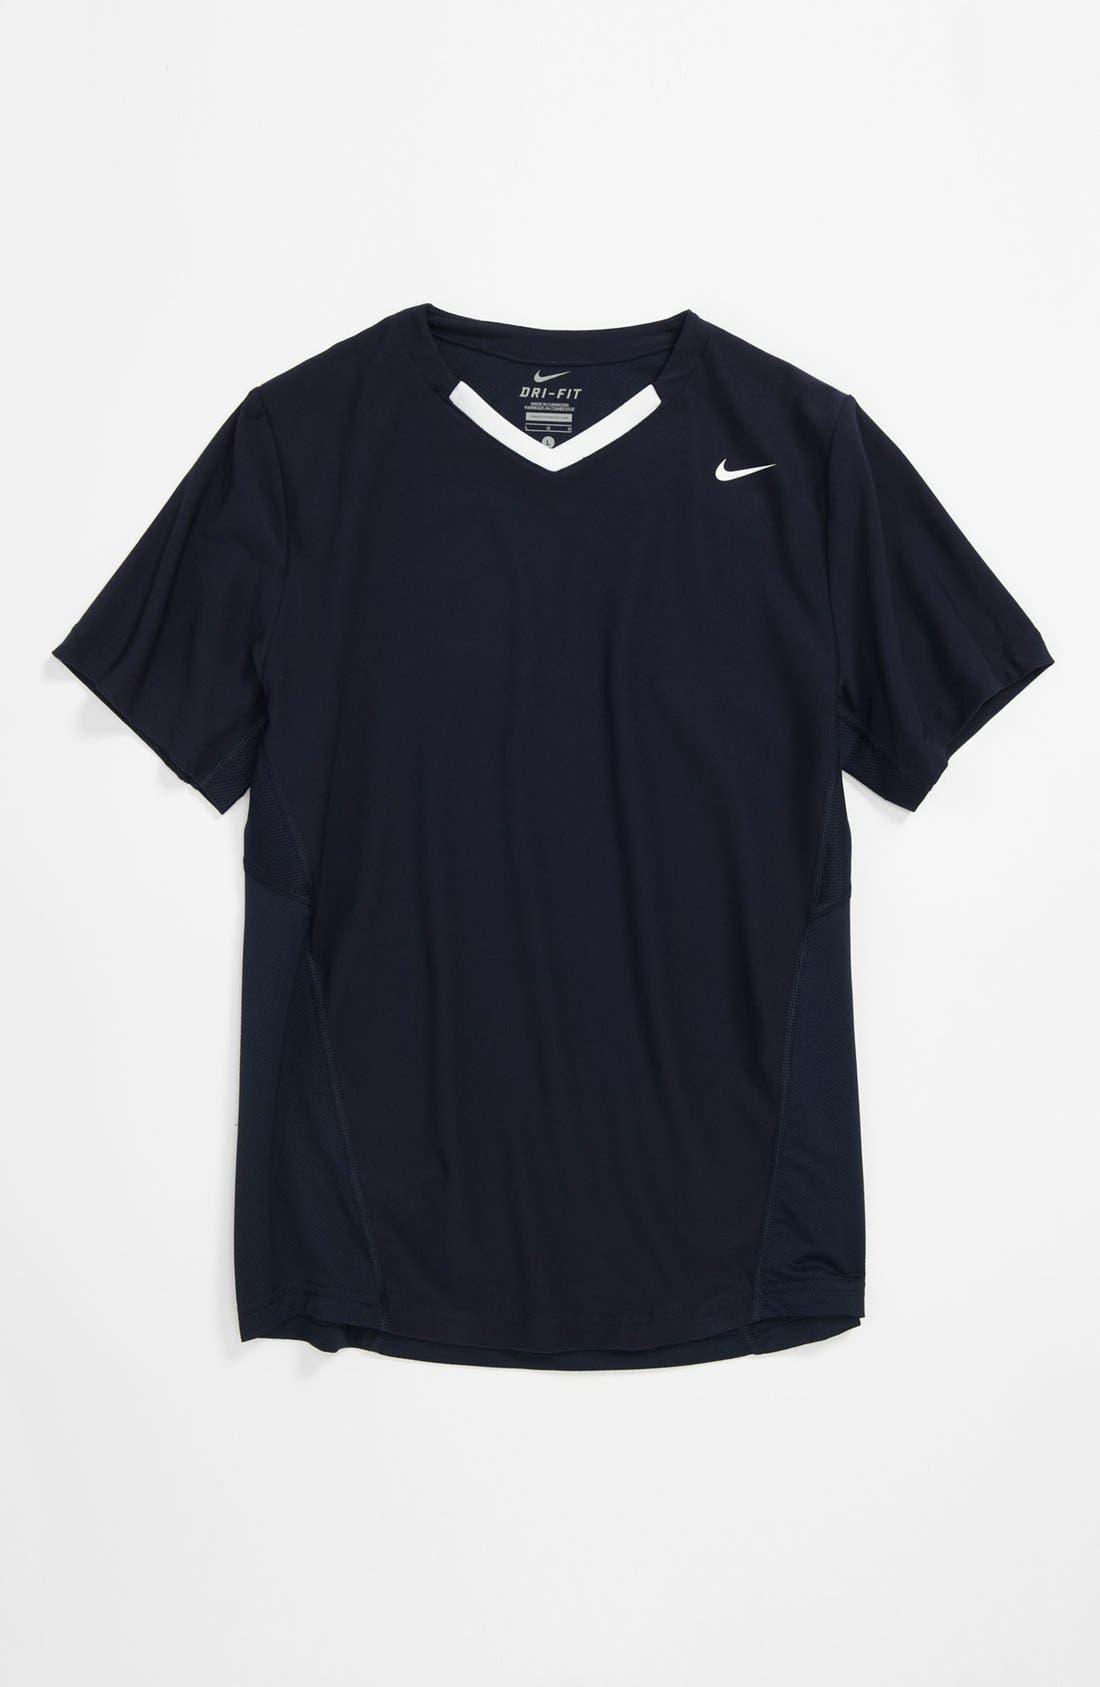 Main Image - Nike 'Premier - Rafa Nadal' Dri-FIT T-Shirt (Big Boys)